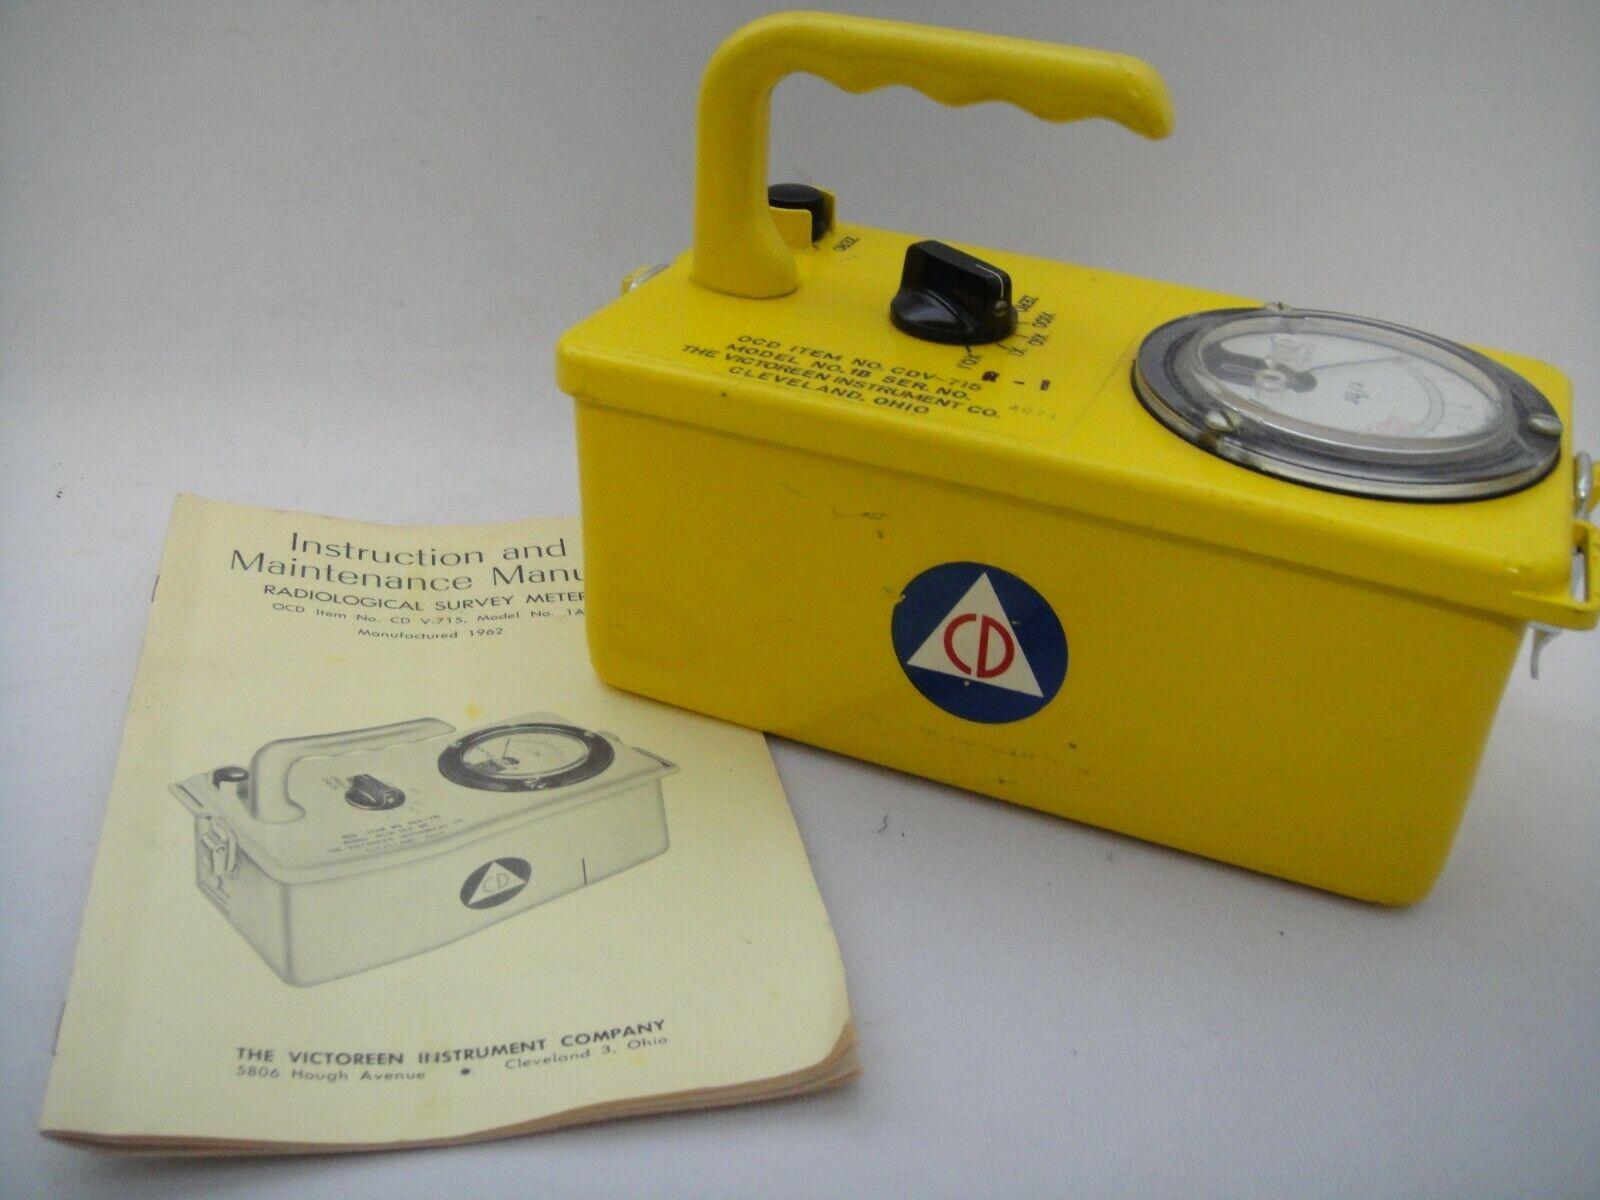 s l1600 - Victoreen Civil Defense Radiological Meter/Geiger Counter CDV715 1b+Manual